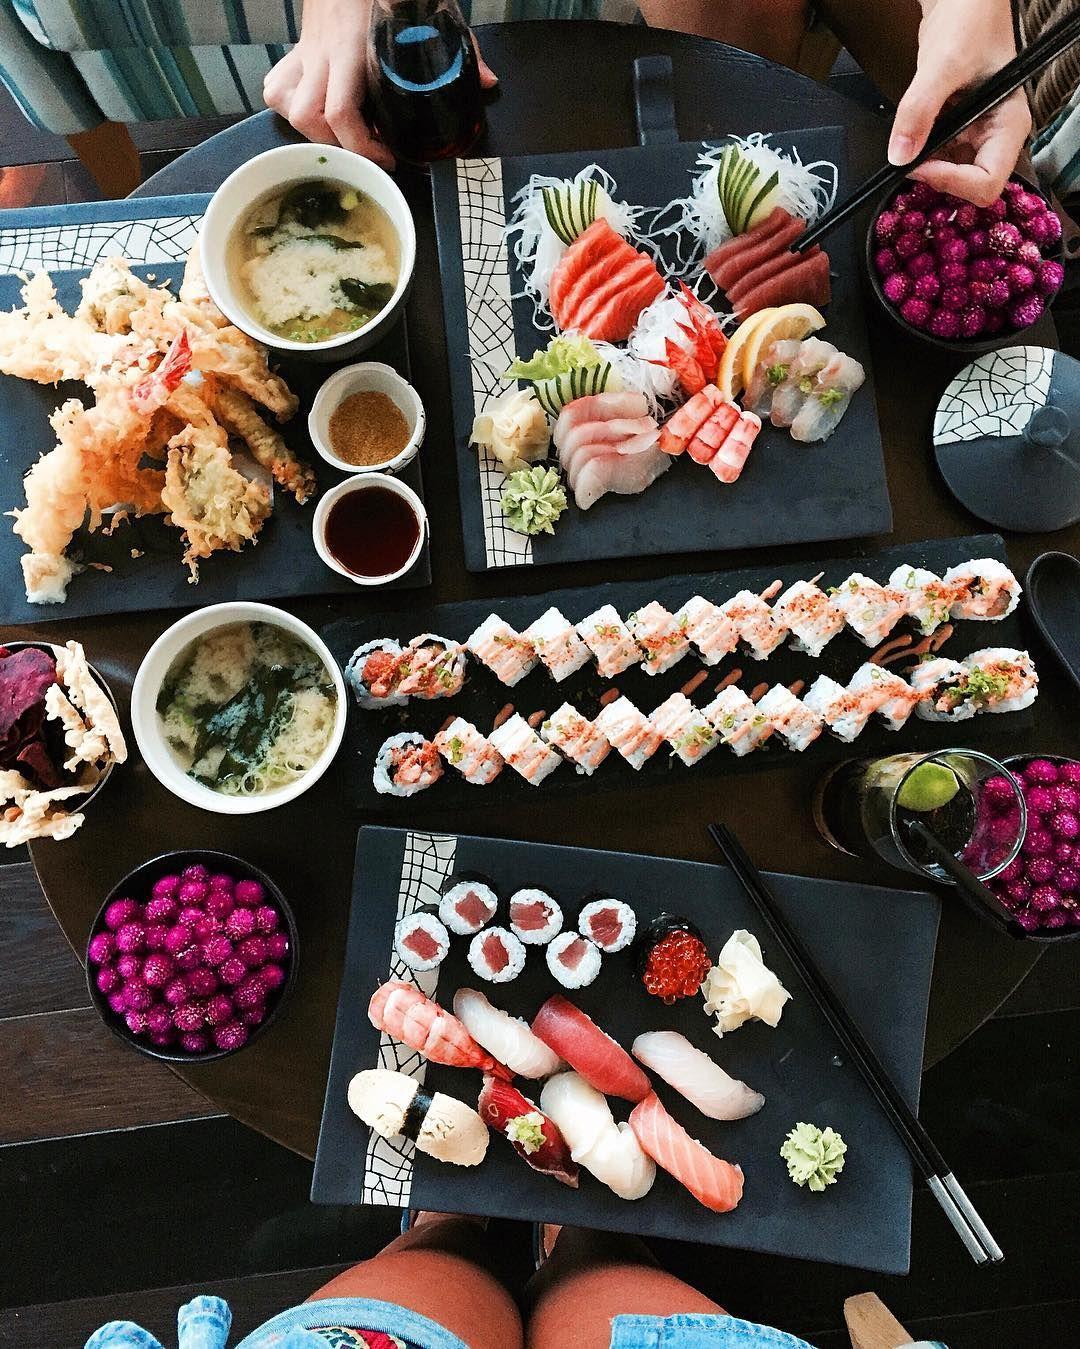 Магазил суши в крупном спальном квартале